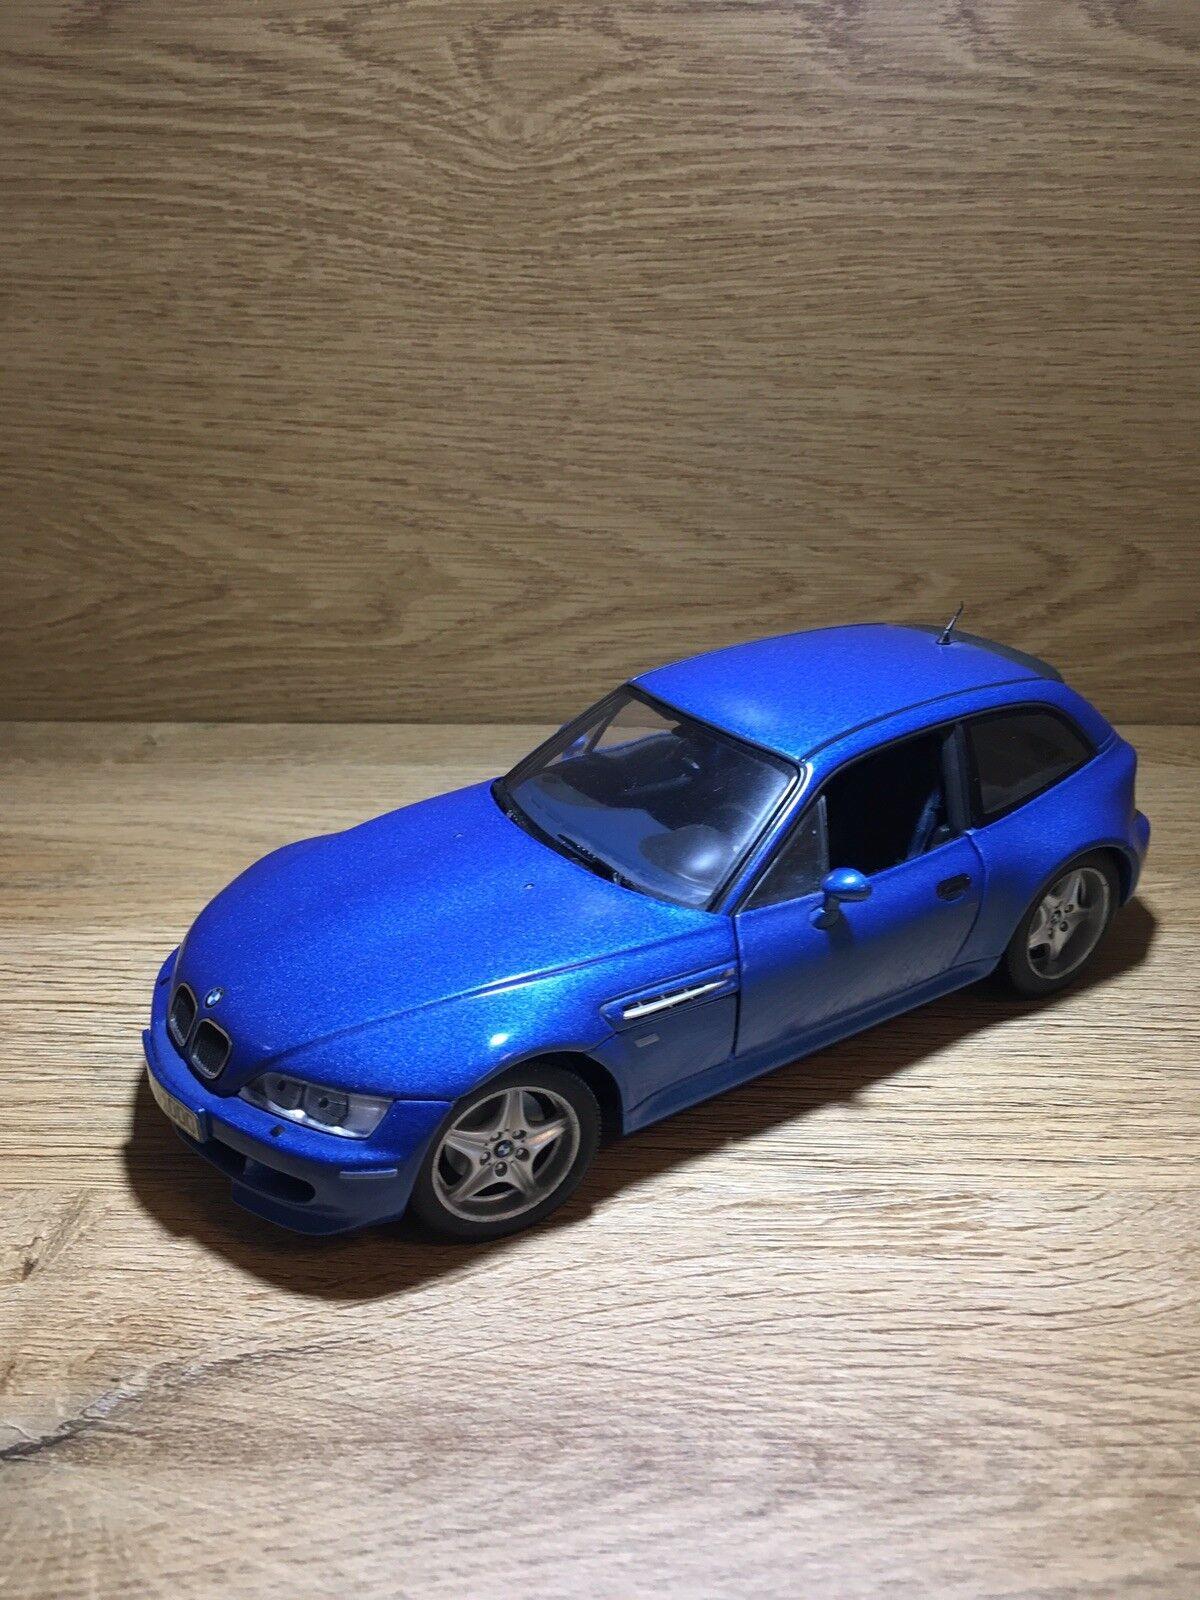 BMW z3 M Coupe, 1 18 UT models model